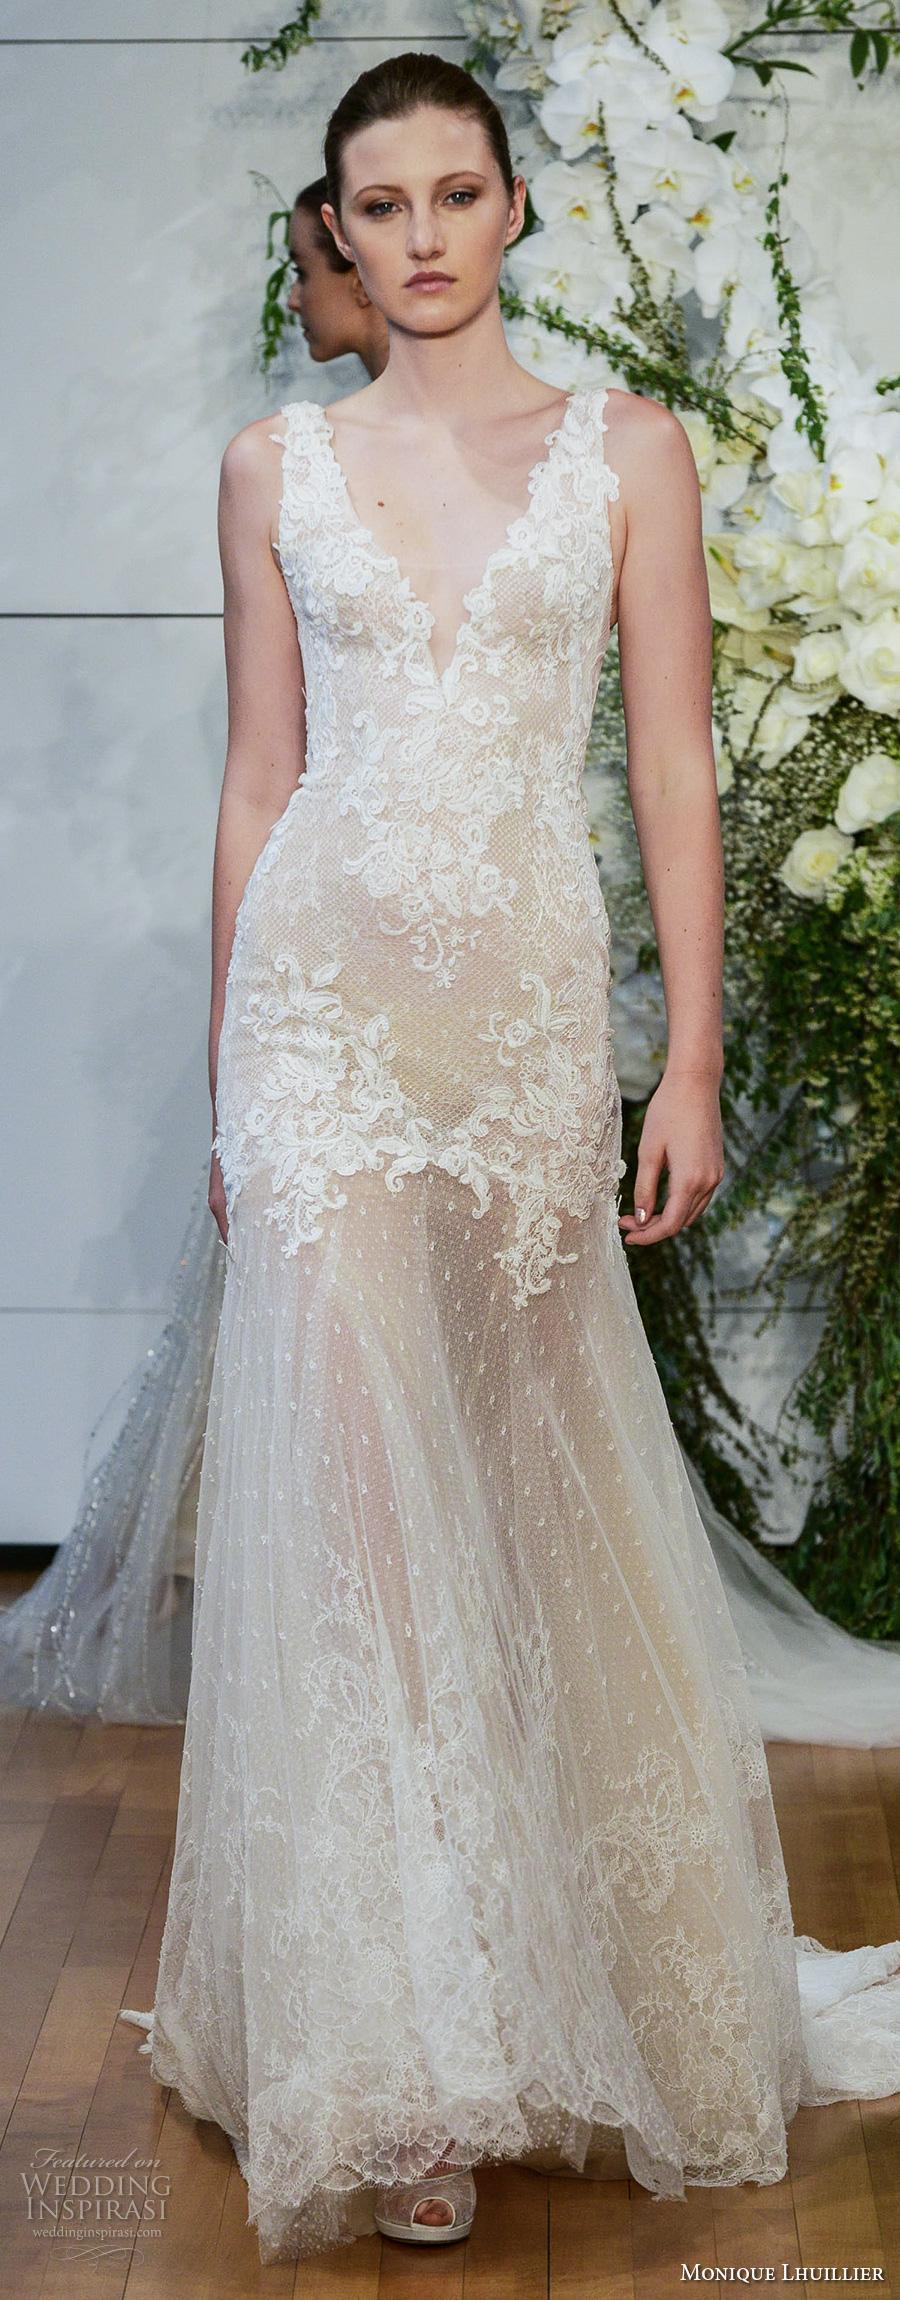 monique lhuillier spring 2018 bridal sleeveless v neck heavily embellished bodice elegant column wedding dress open scoop back short train (dylan) mv